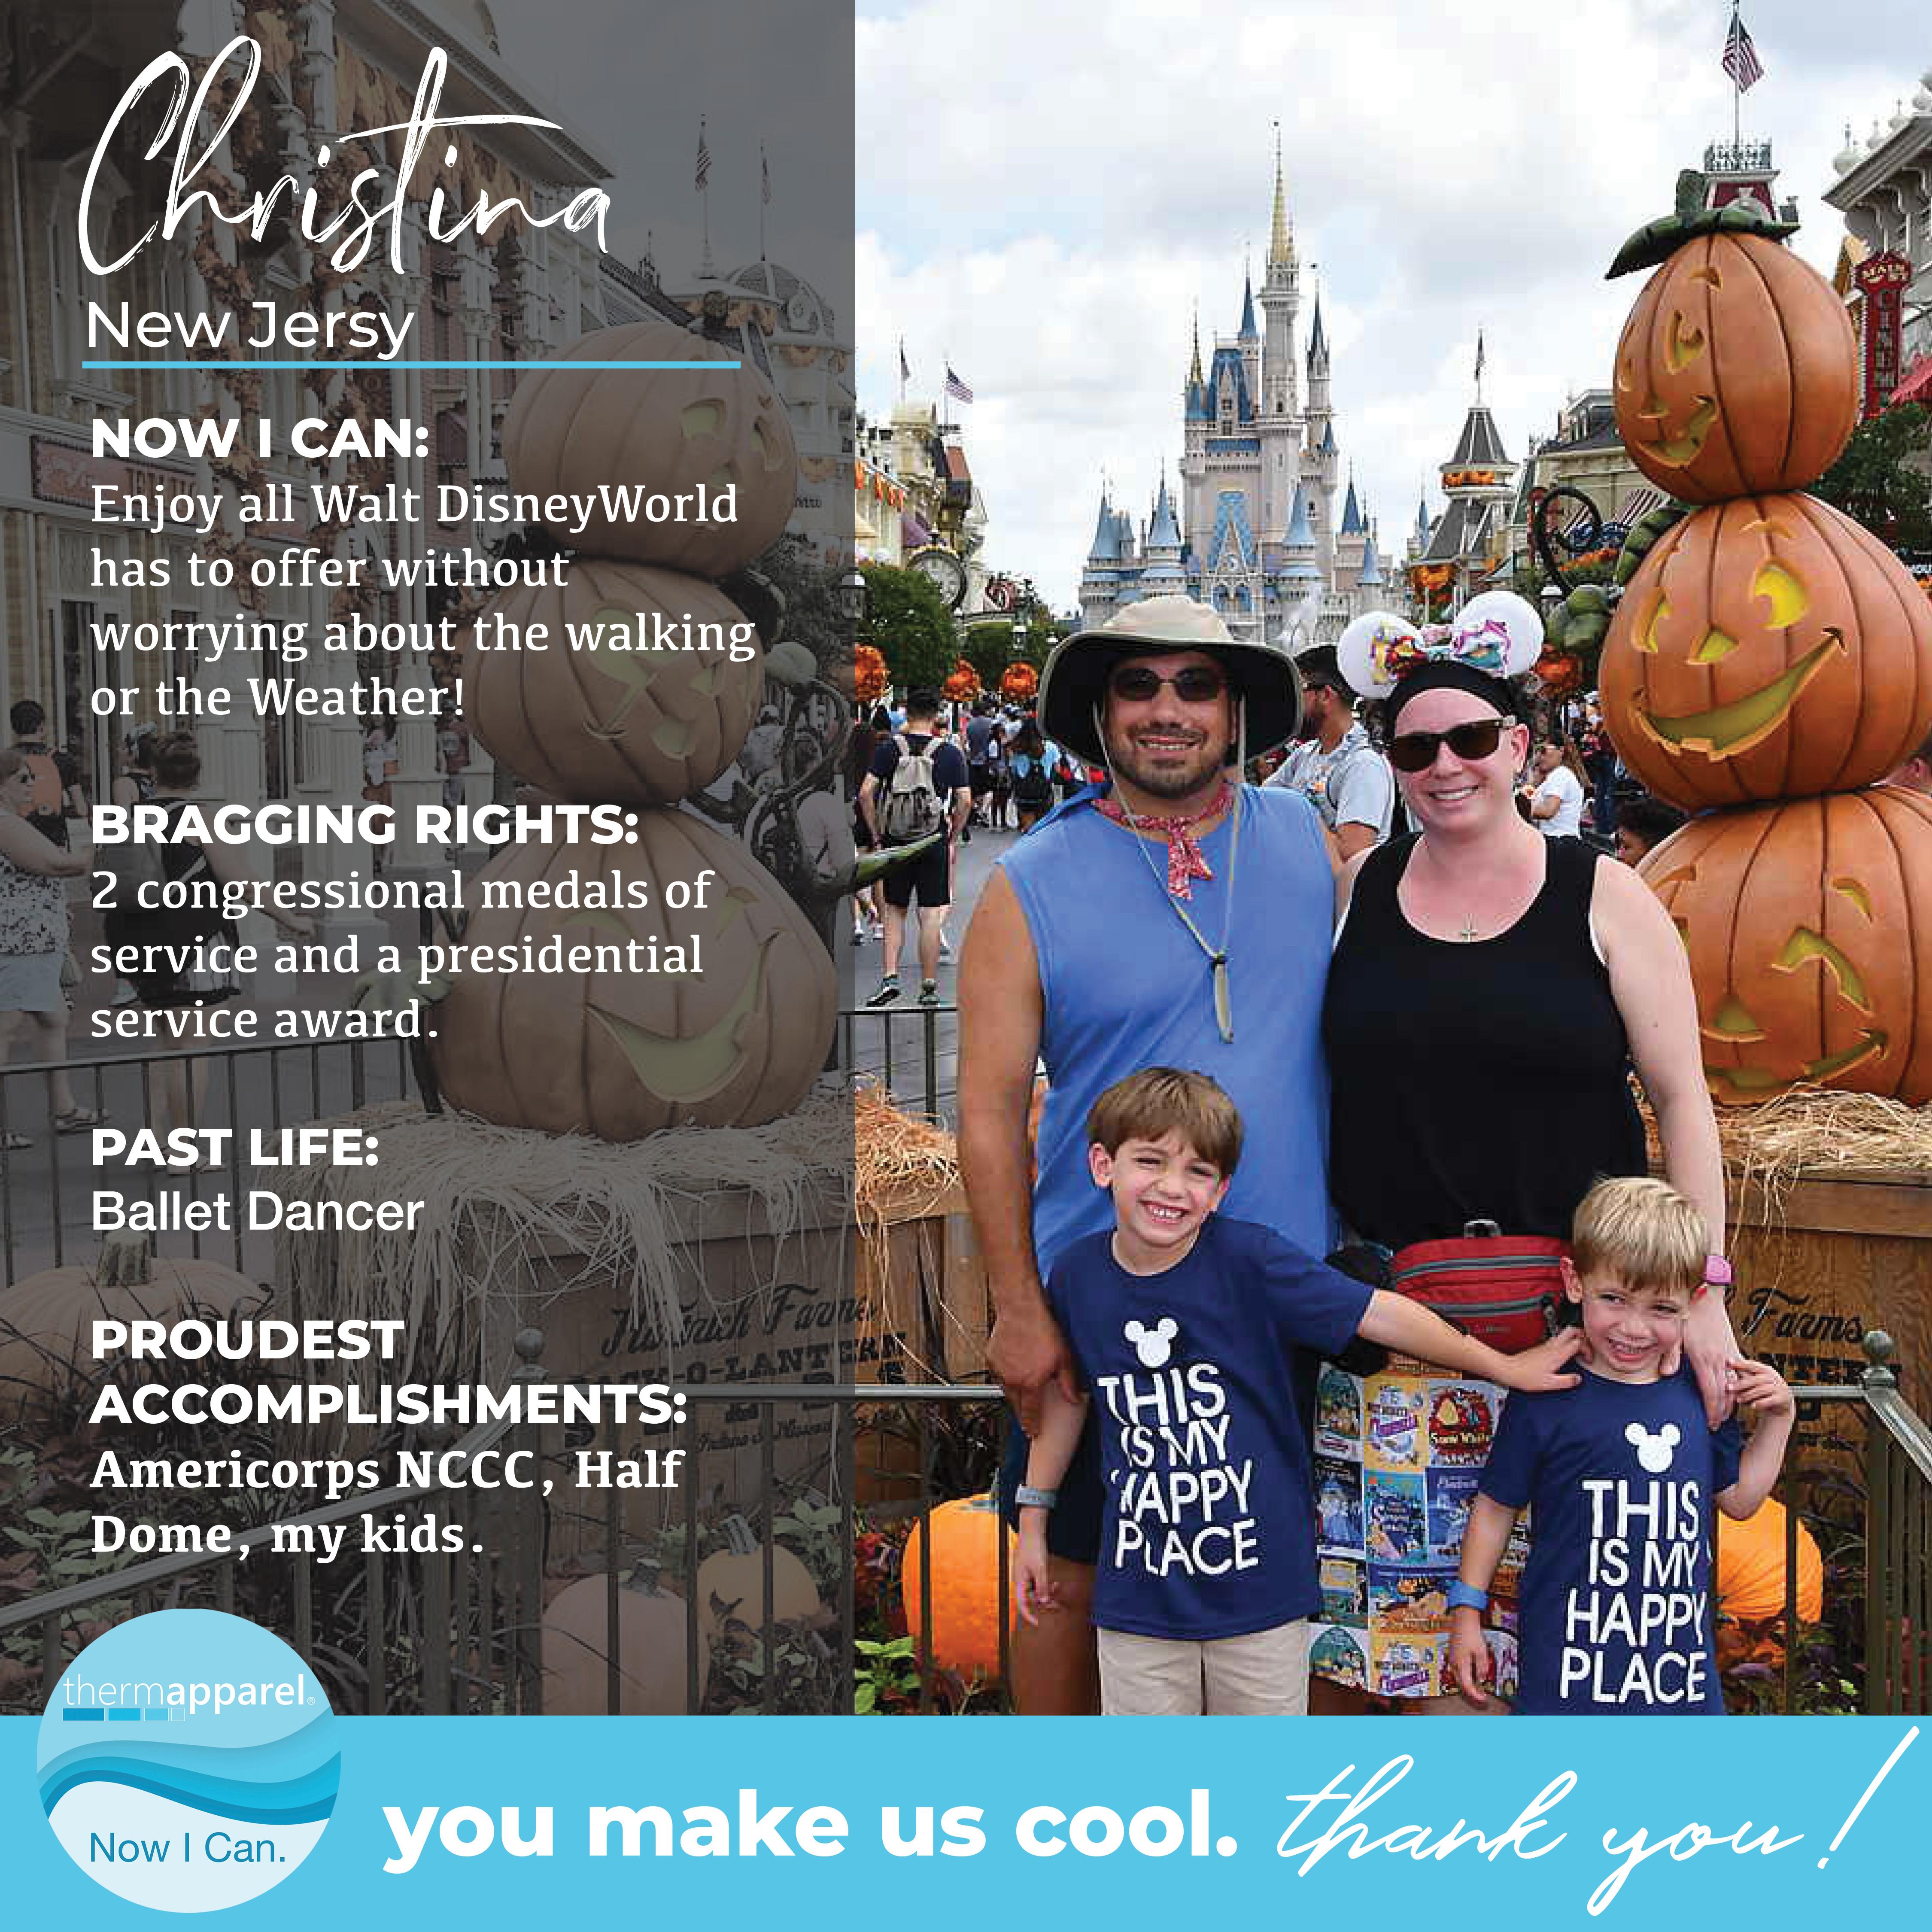 Staying Cool at Walt Disney World